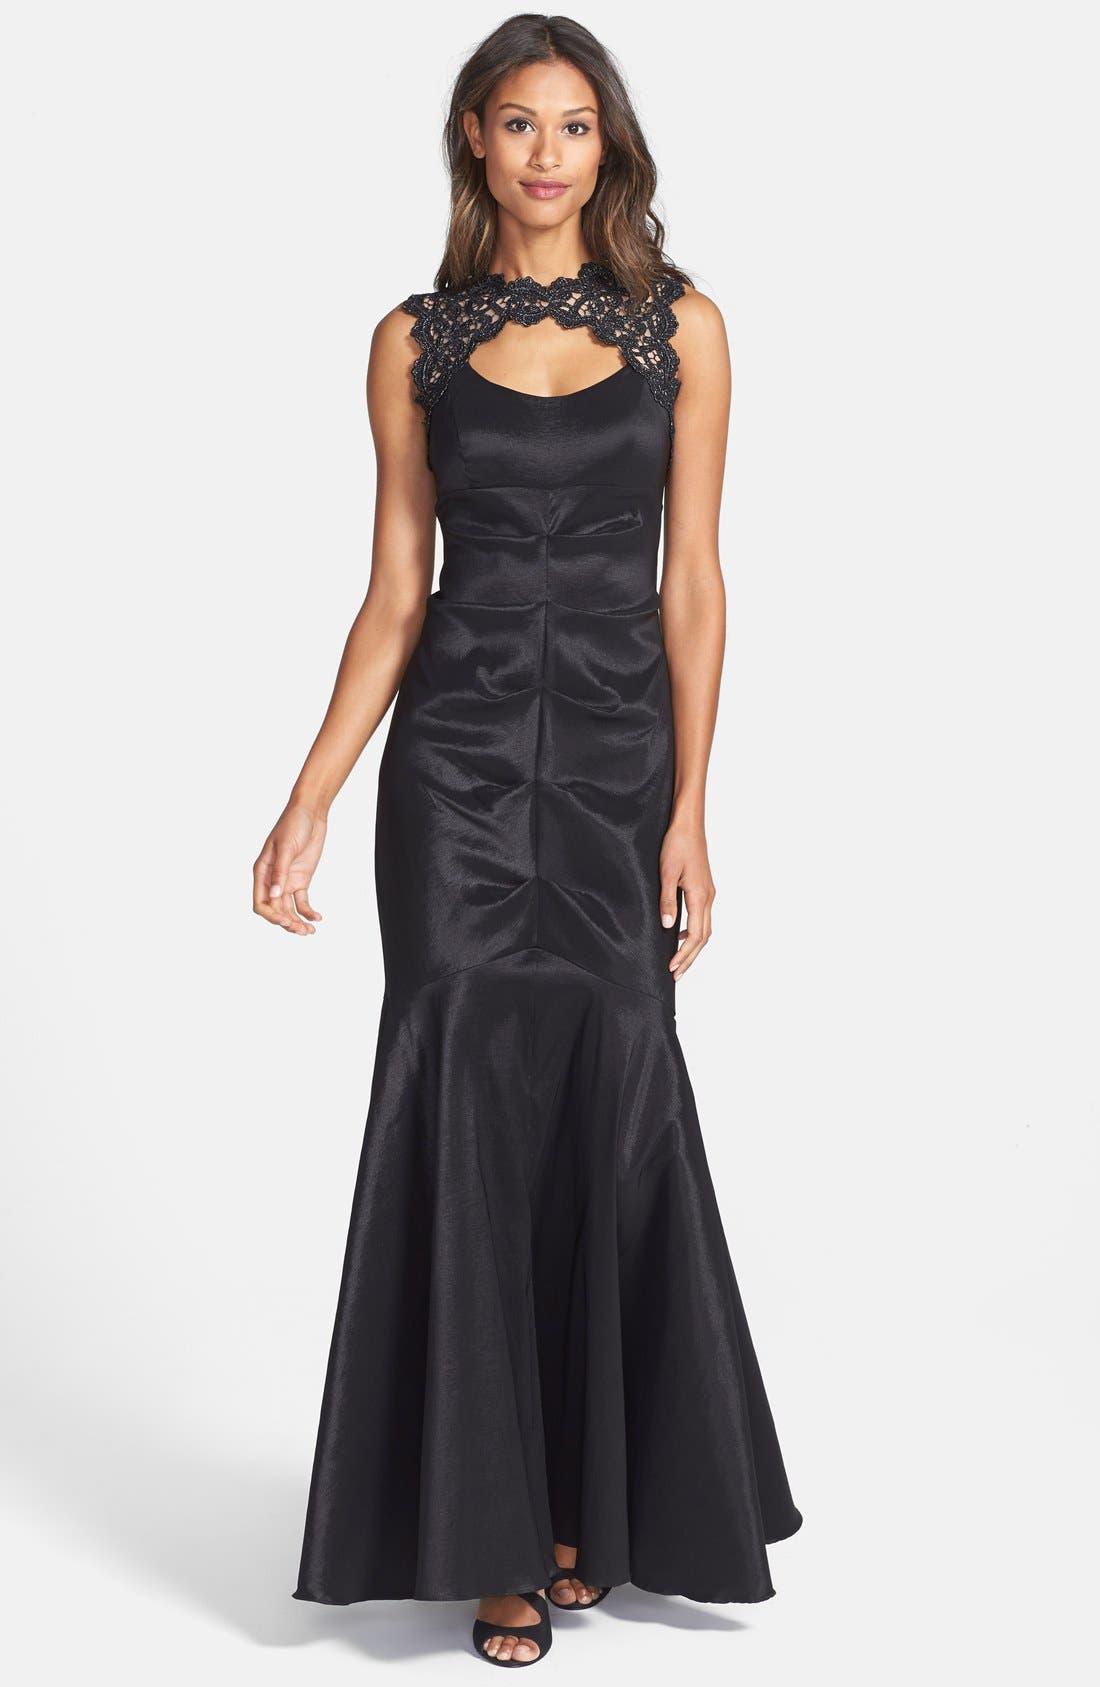 Main Image - Xscape Lace & Taffeta Mermaid Gown (Regular & Petite)